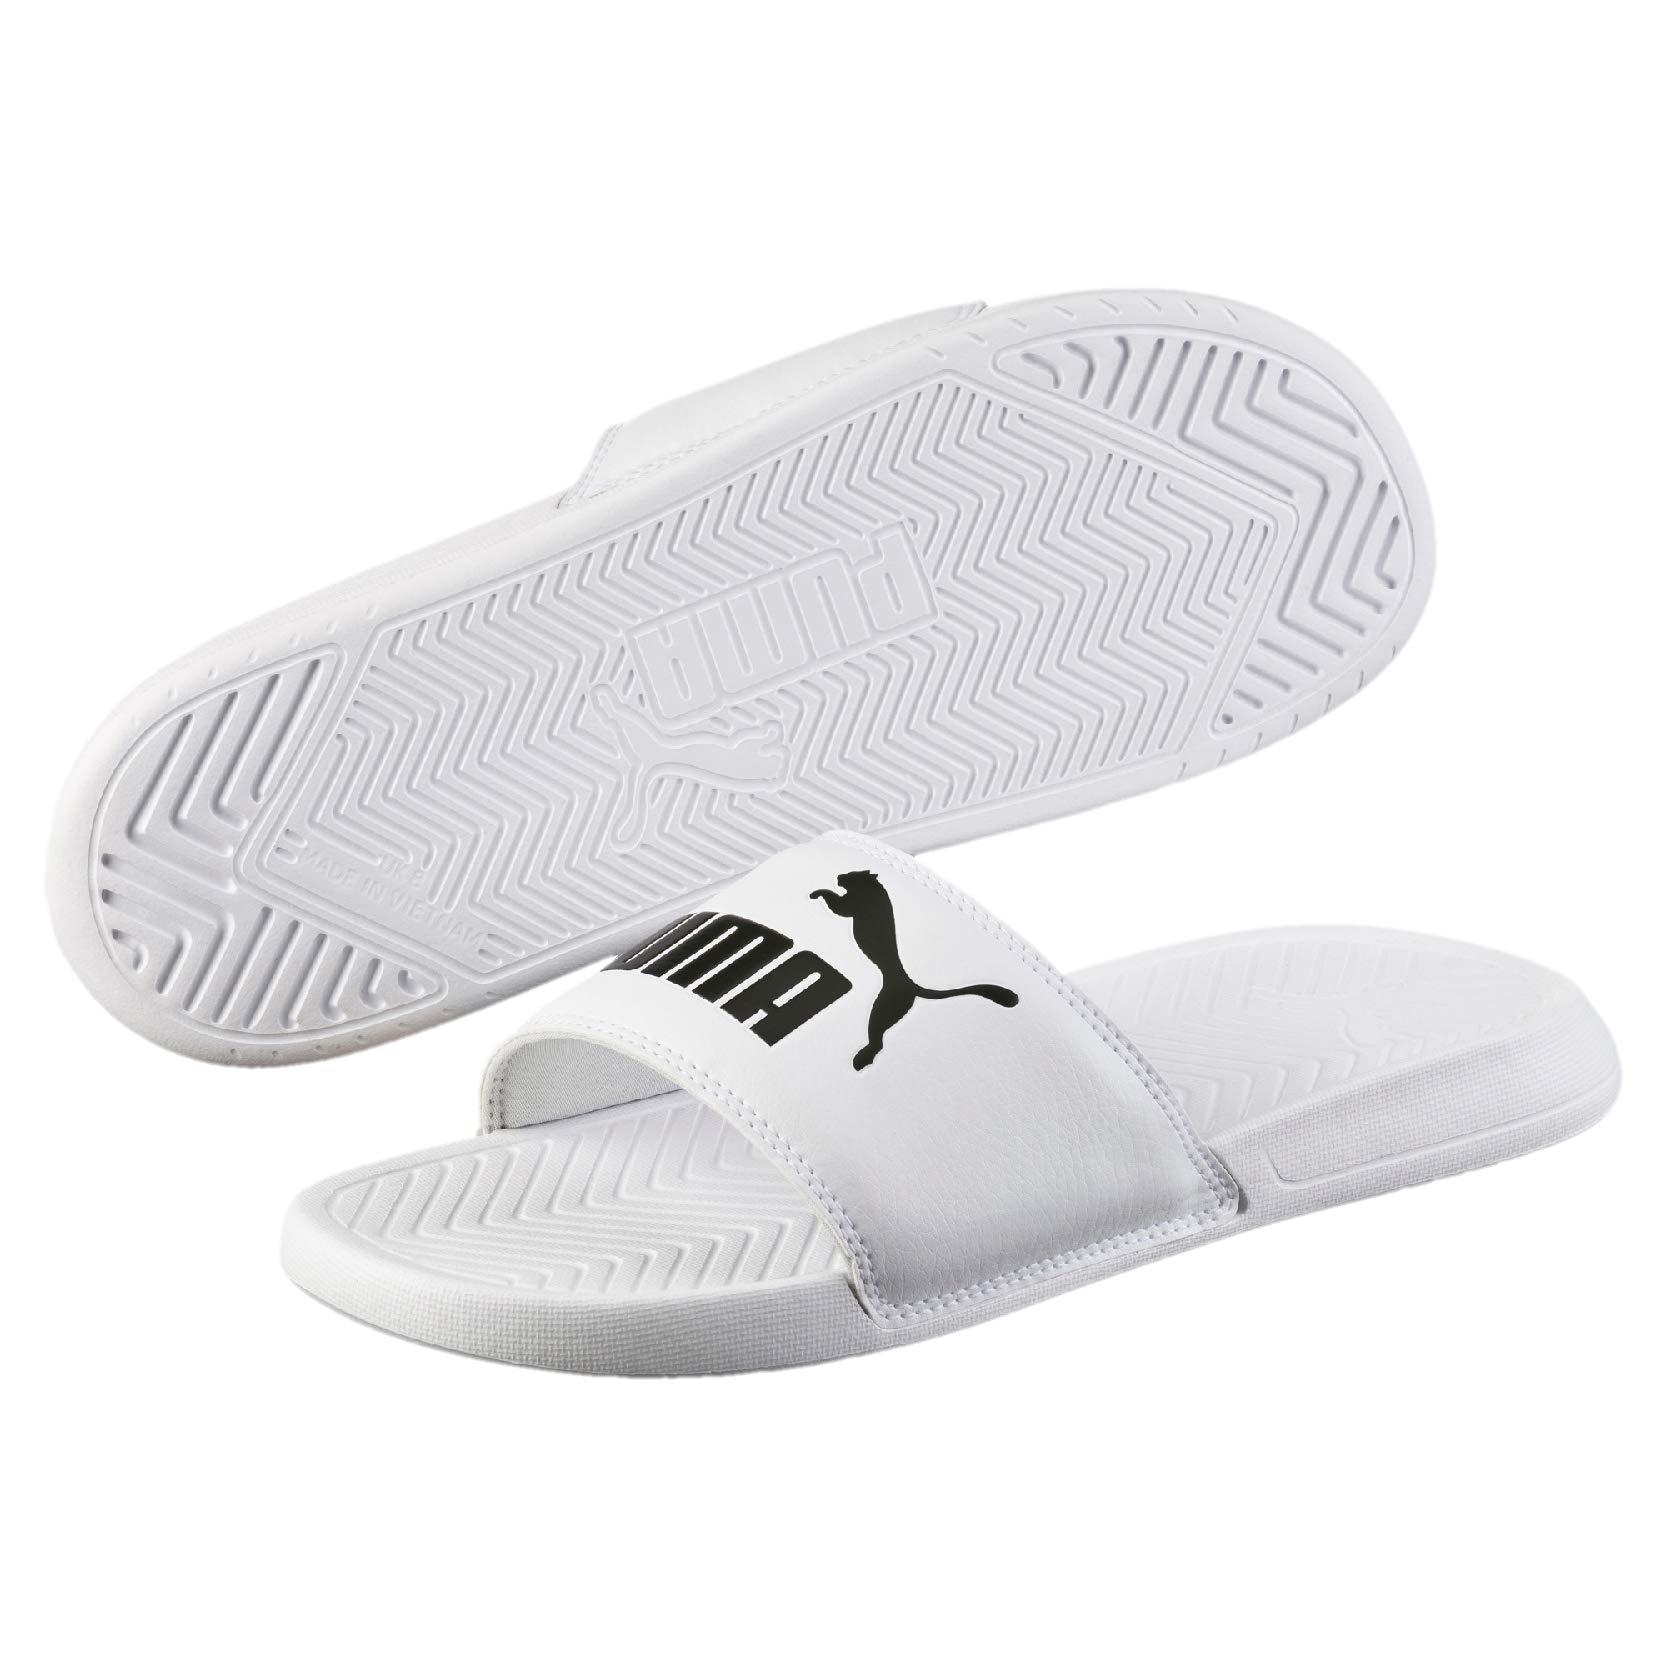 puma chaussure de plage